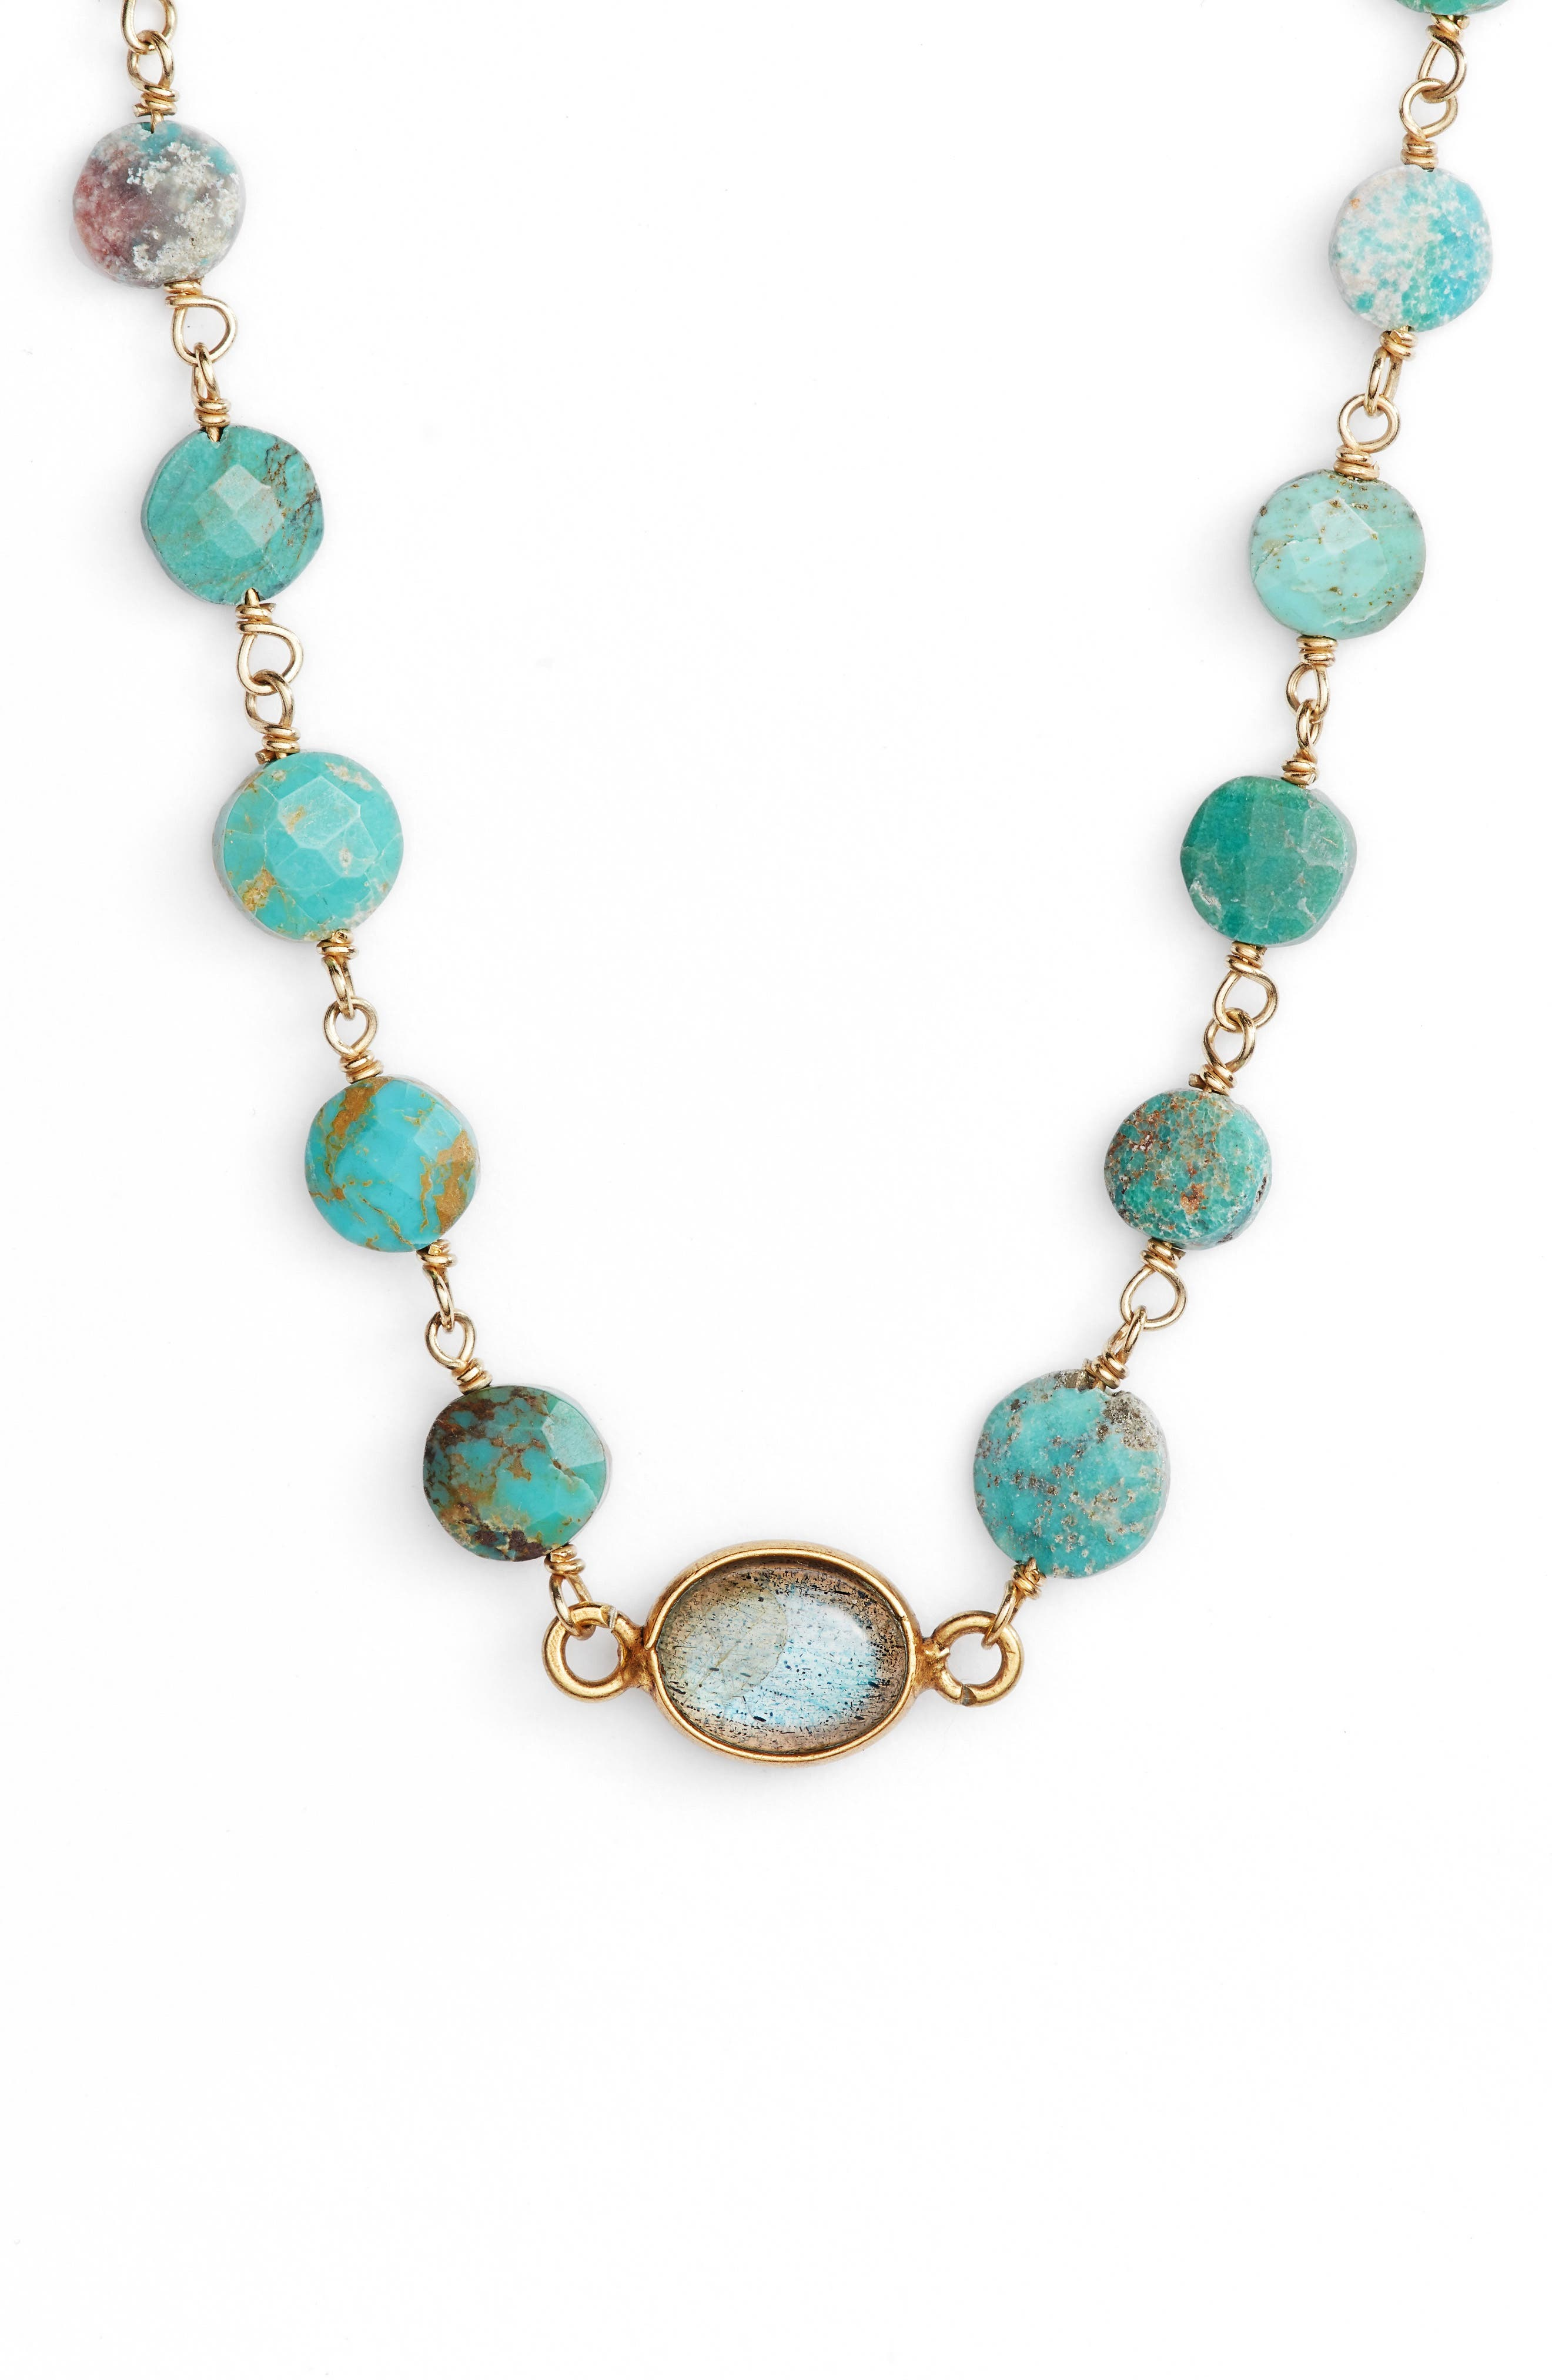 Main Image - ela rae Libi Coin Pendant Necklace